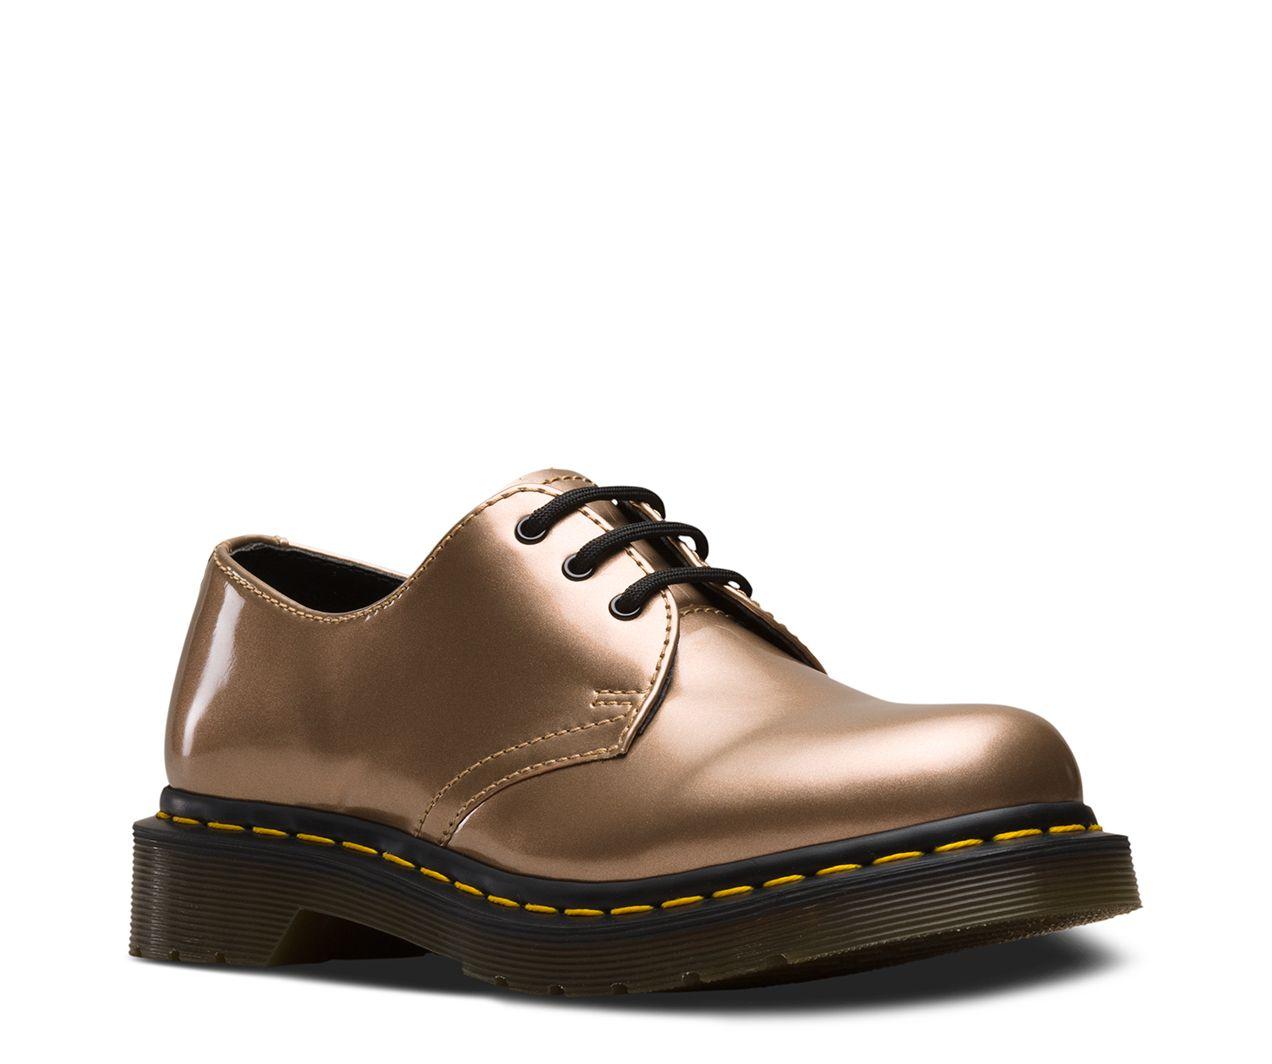 Dr.Martens Femme 1461 Vegan Chrome Paint Metallic Synthetic Chaussures